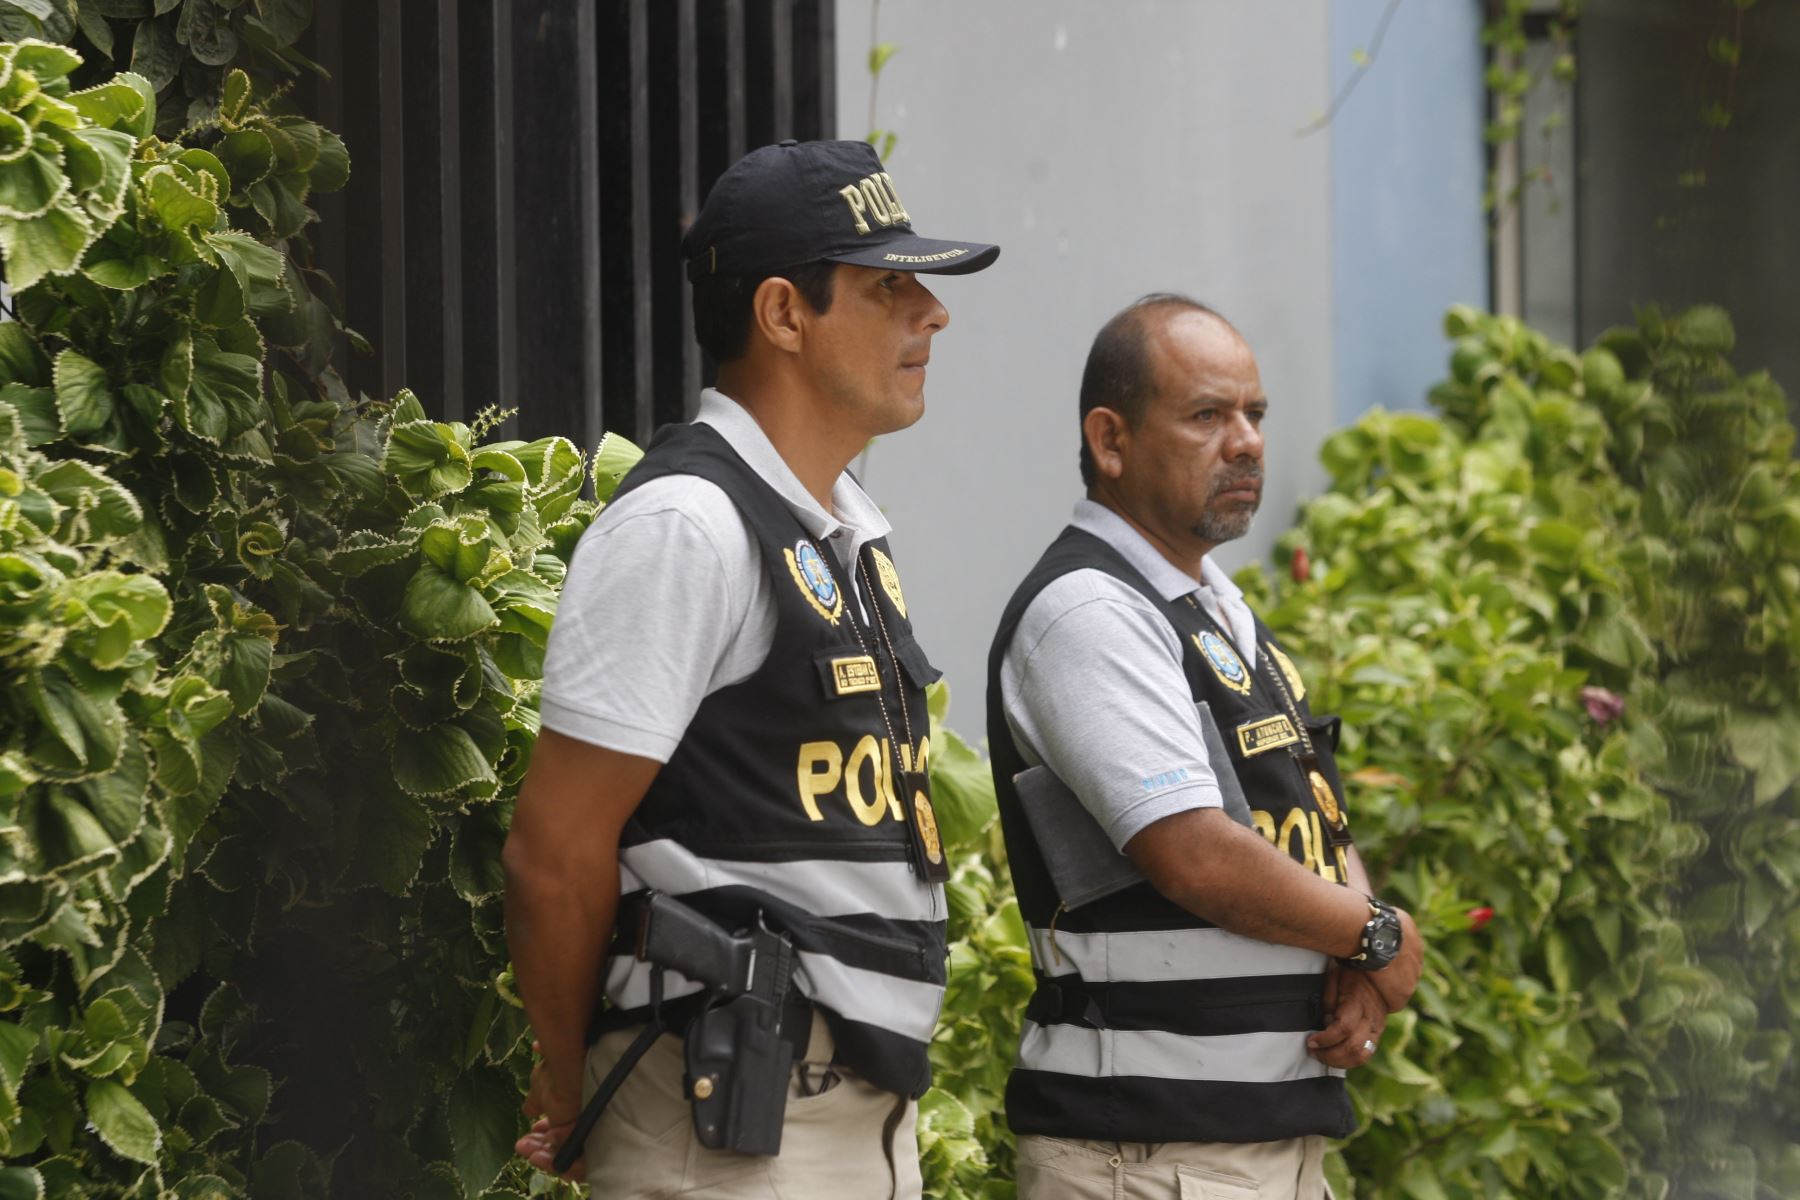 Fiscalía allana casa de Augusto Bedoya. Foto: ANDINA/Eddy Ramos.